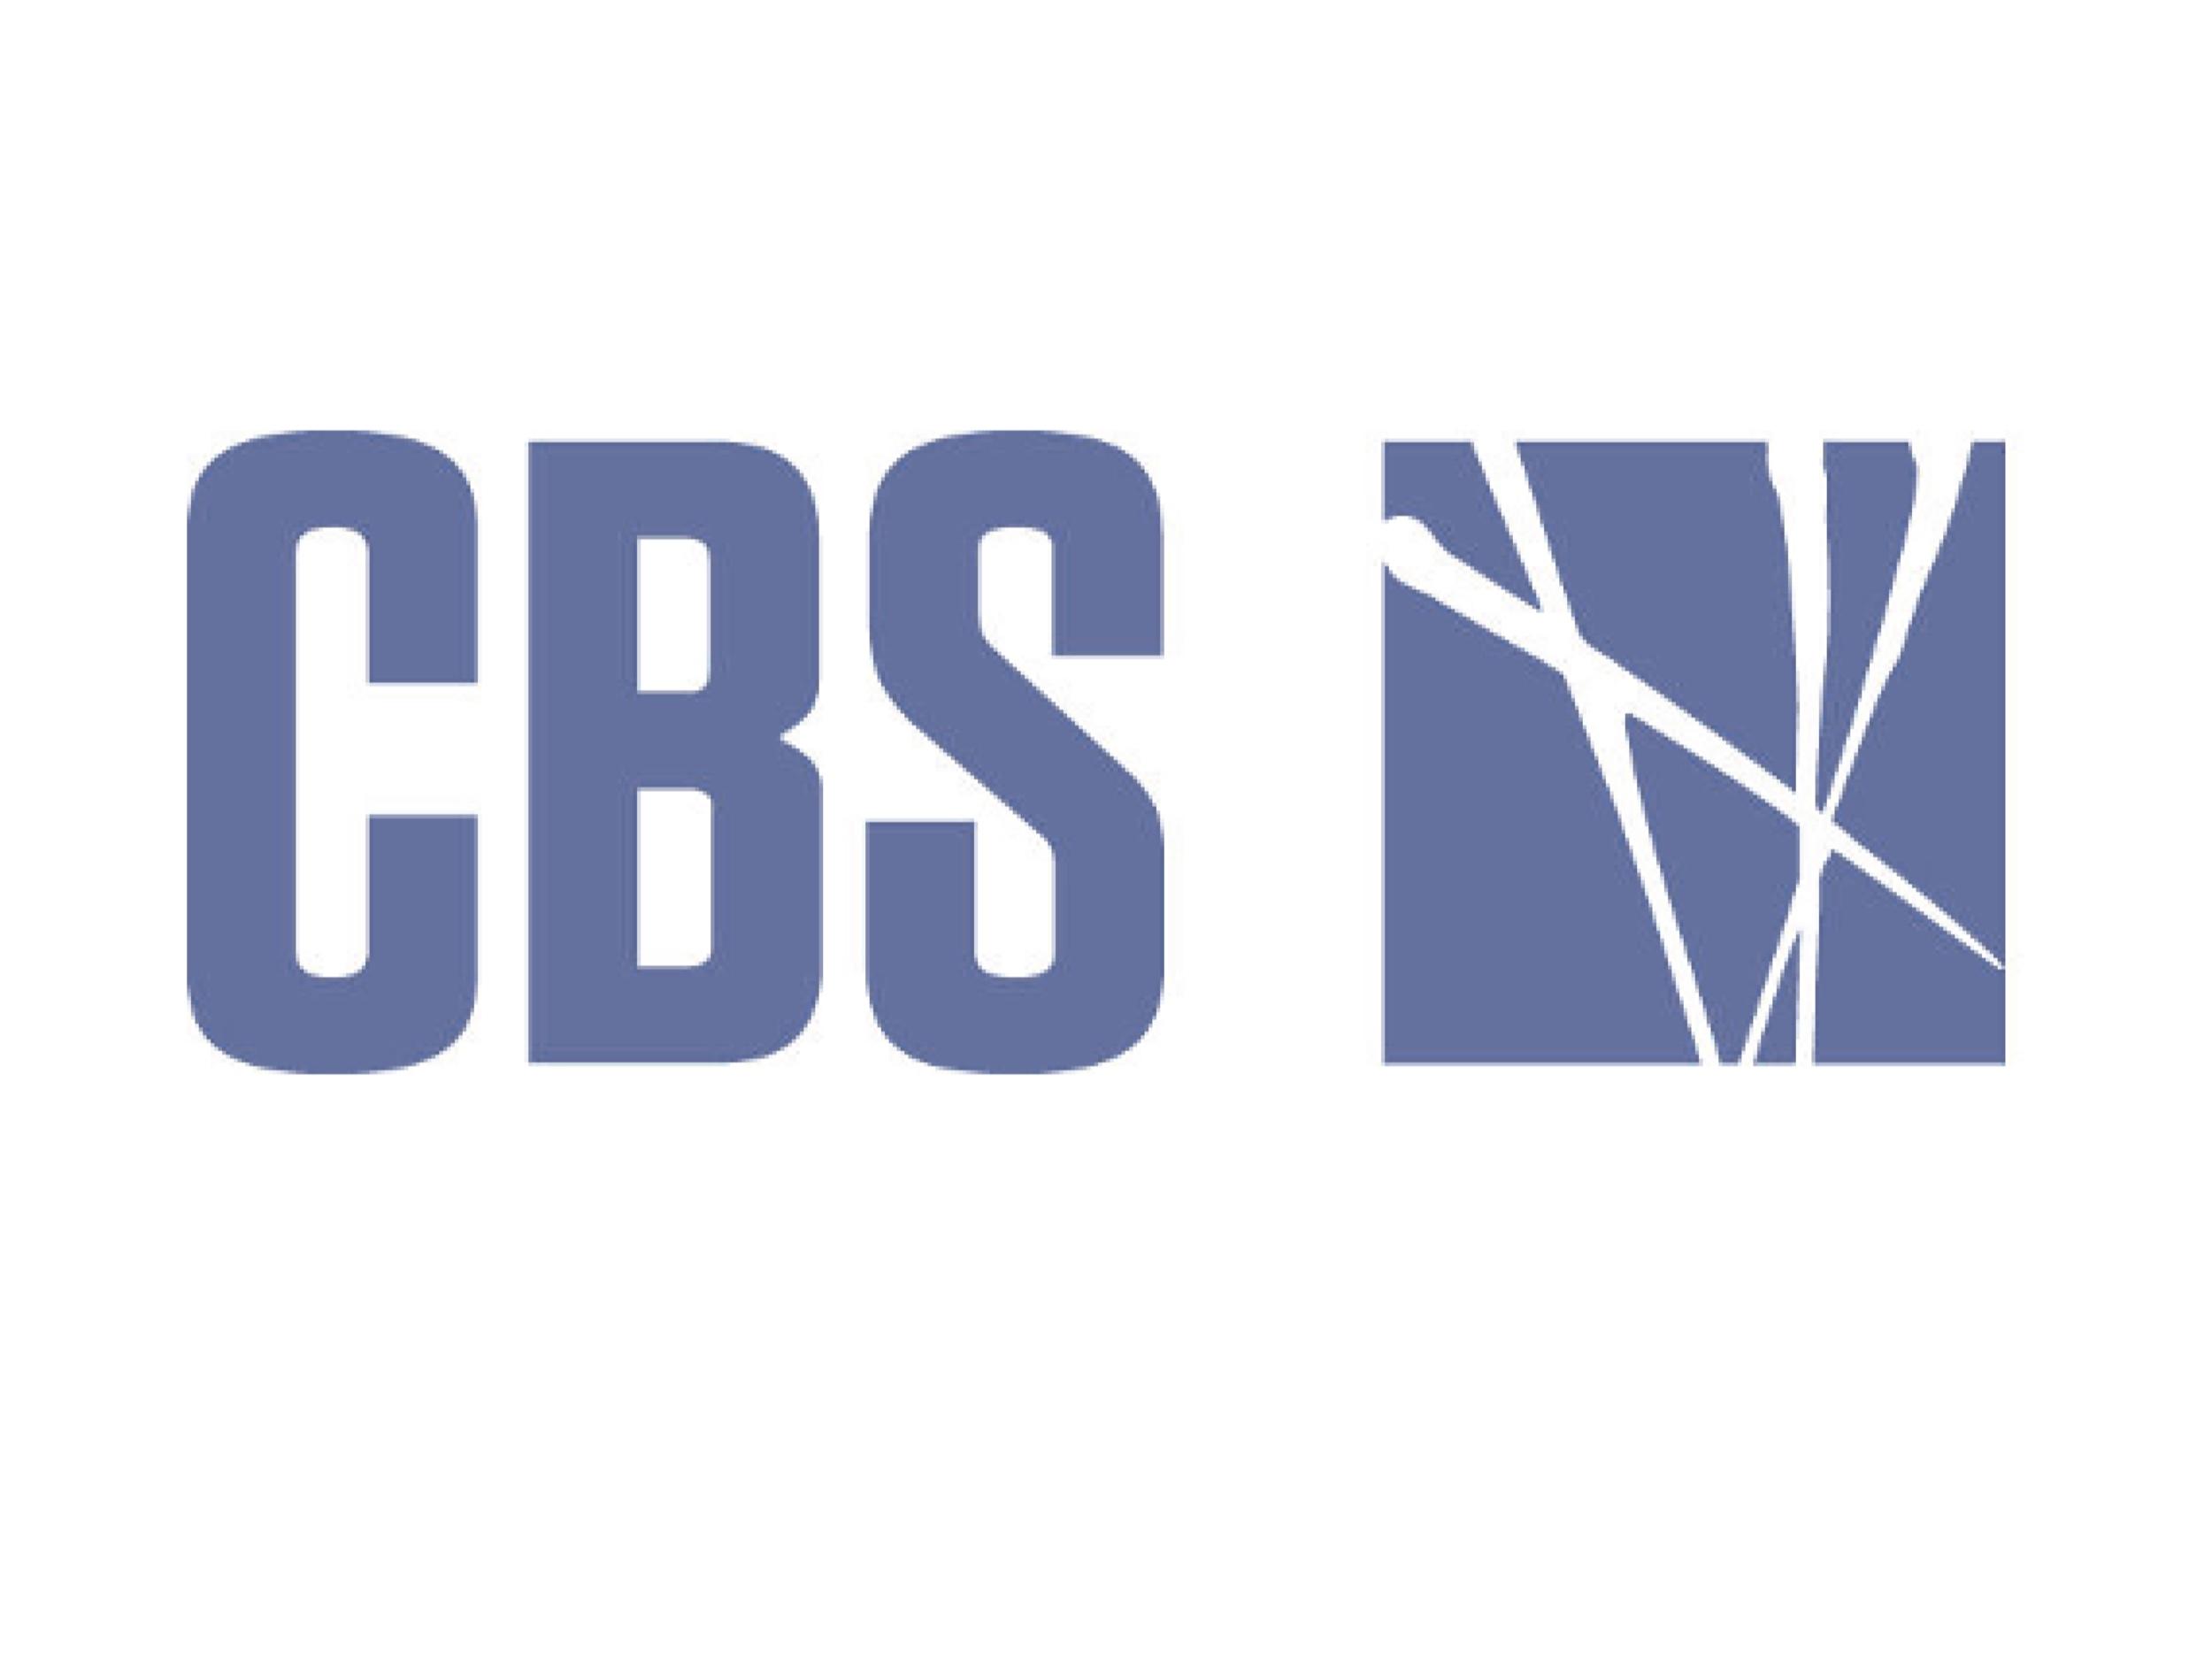 cbs-coursera-logo-square__1280x1280px.jpg